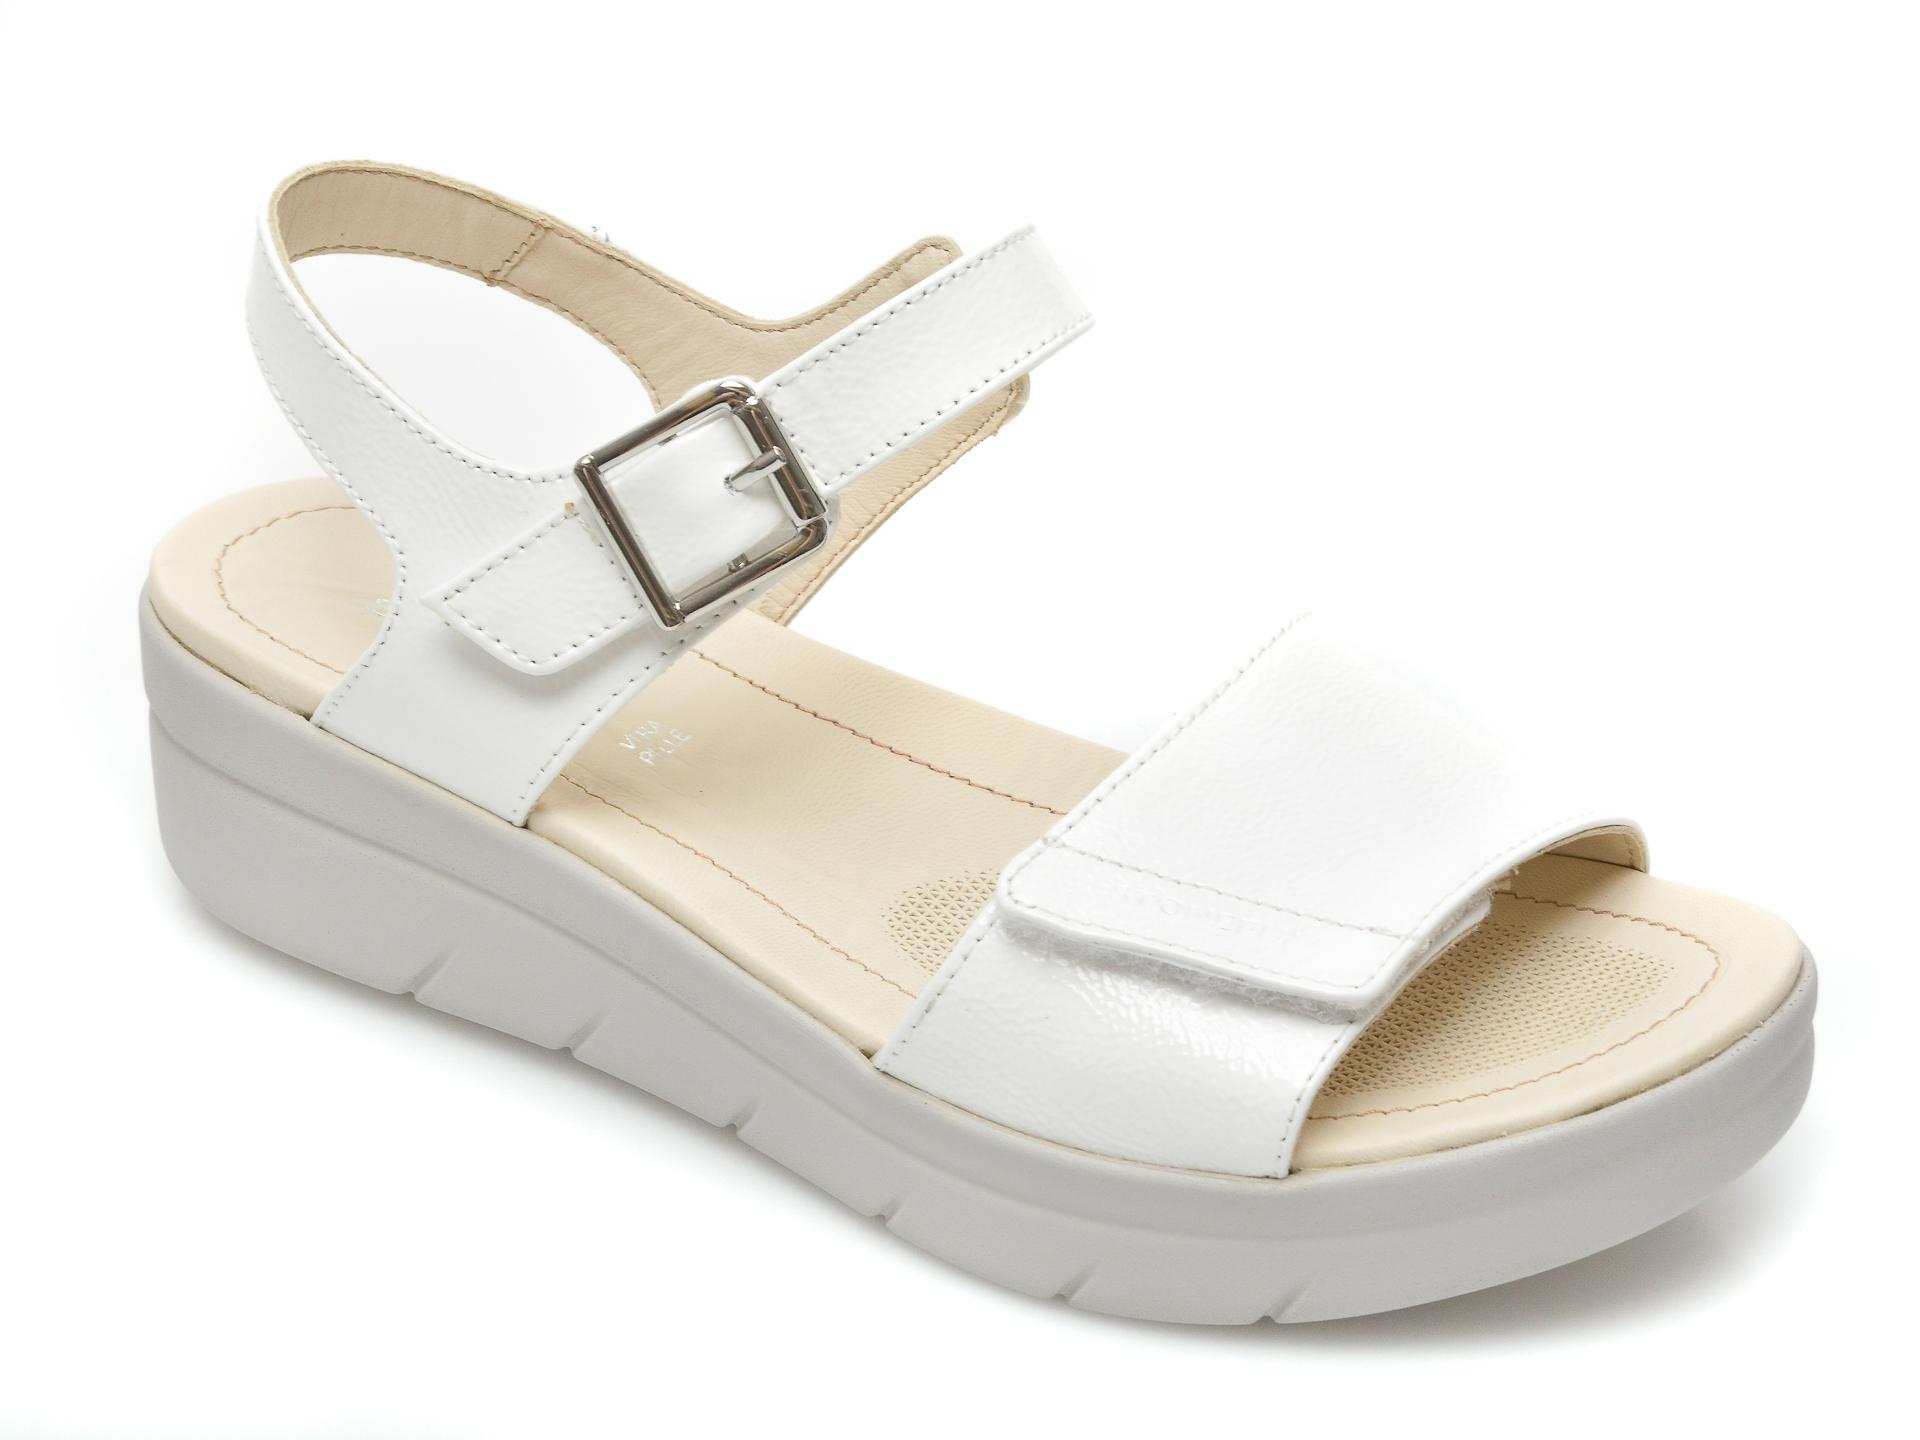 Sandale STONEFLY albe, Aquii2, din piele naturala